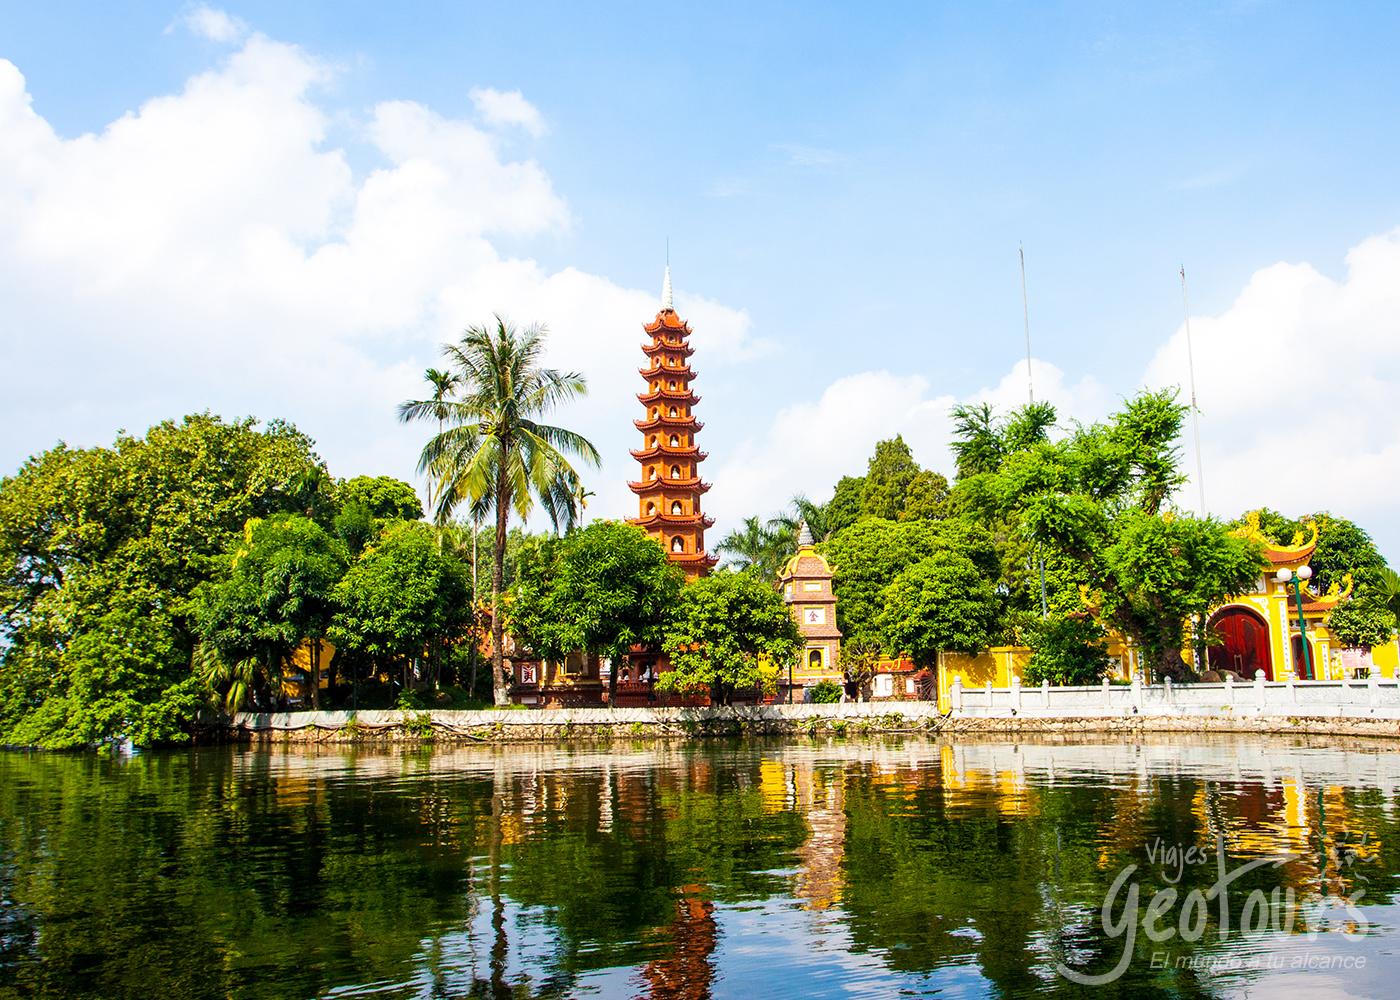 Paquetes a Vietnam con Camboya